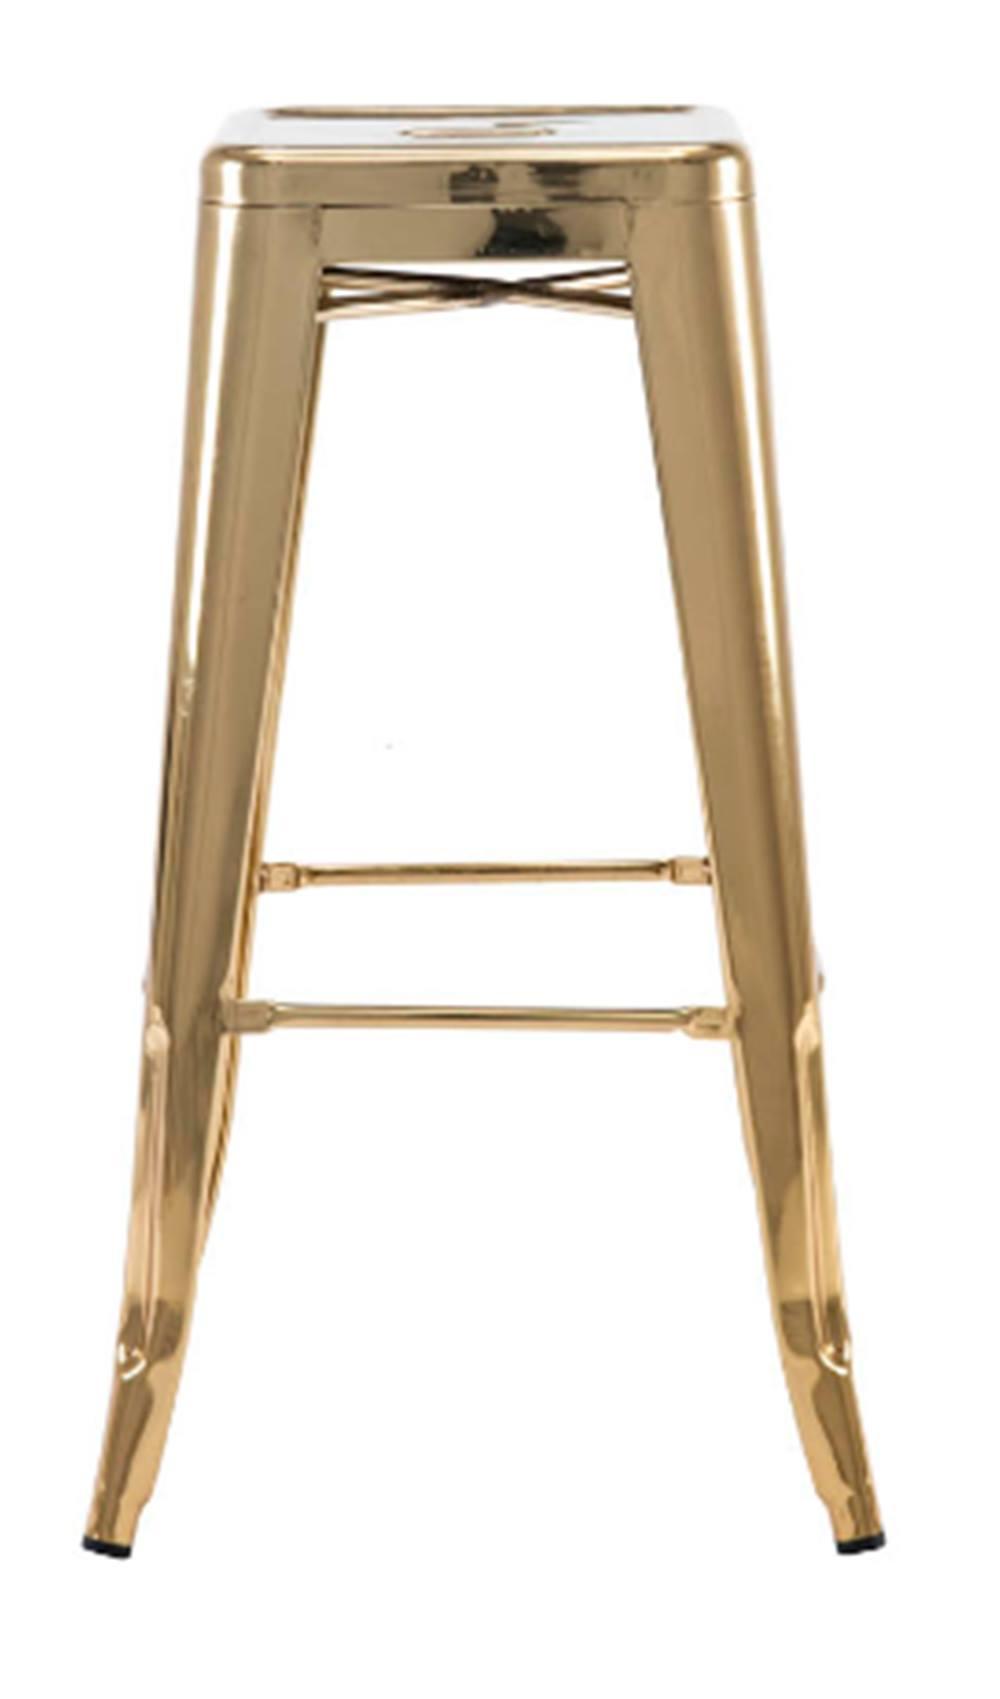 Banqueta Iron Alta Espelhada Dourada 76 cm (ALT) - 49950